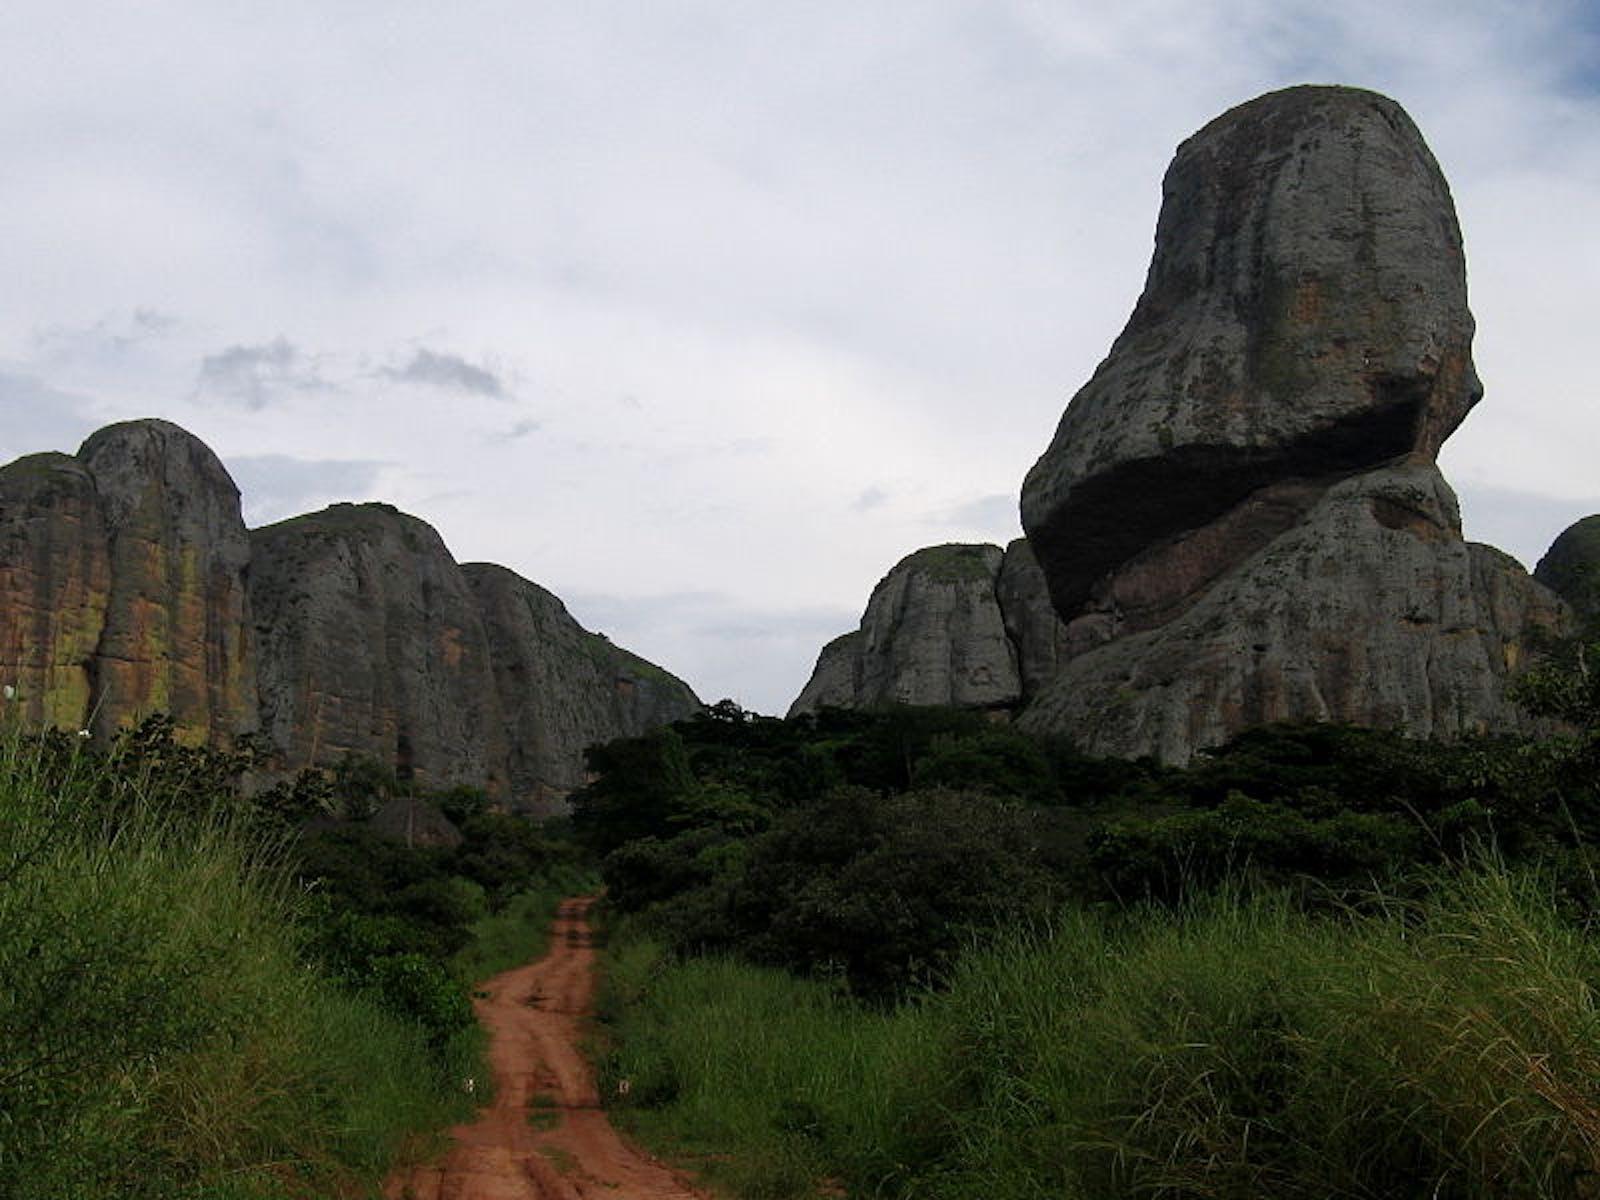 Angolan Wet Miombo Woodlands